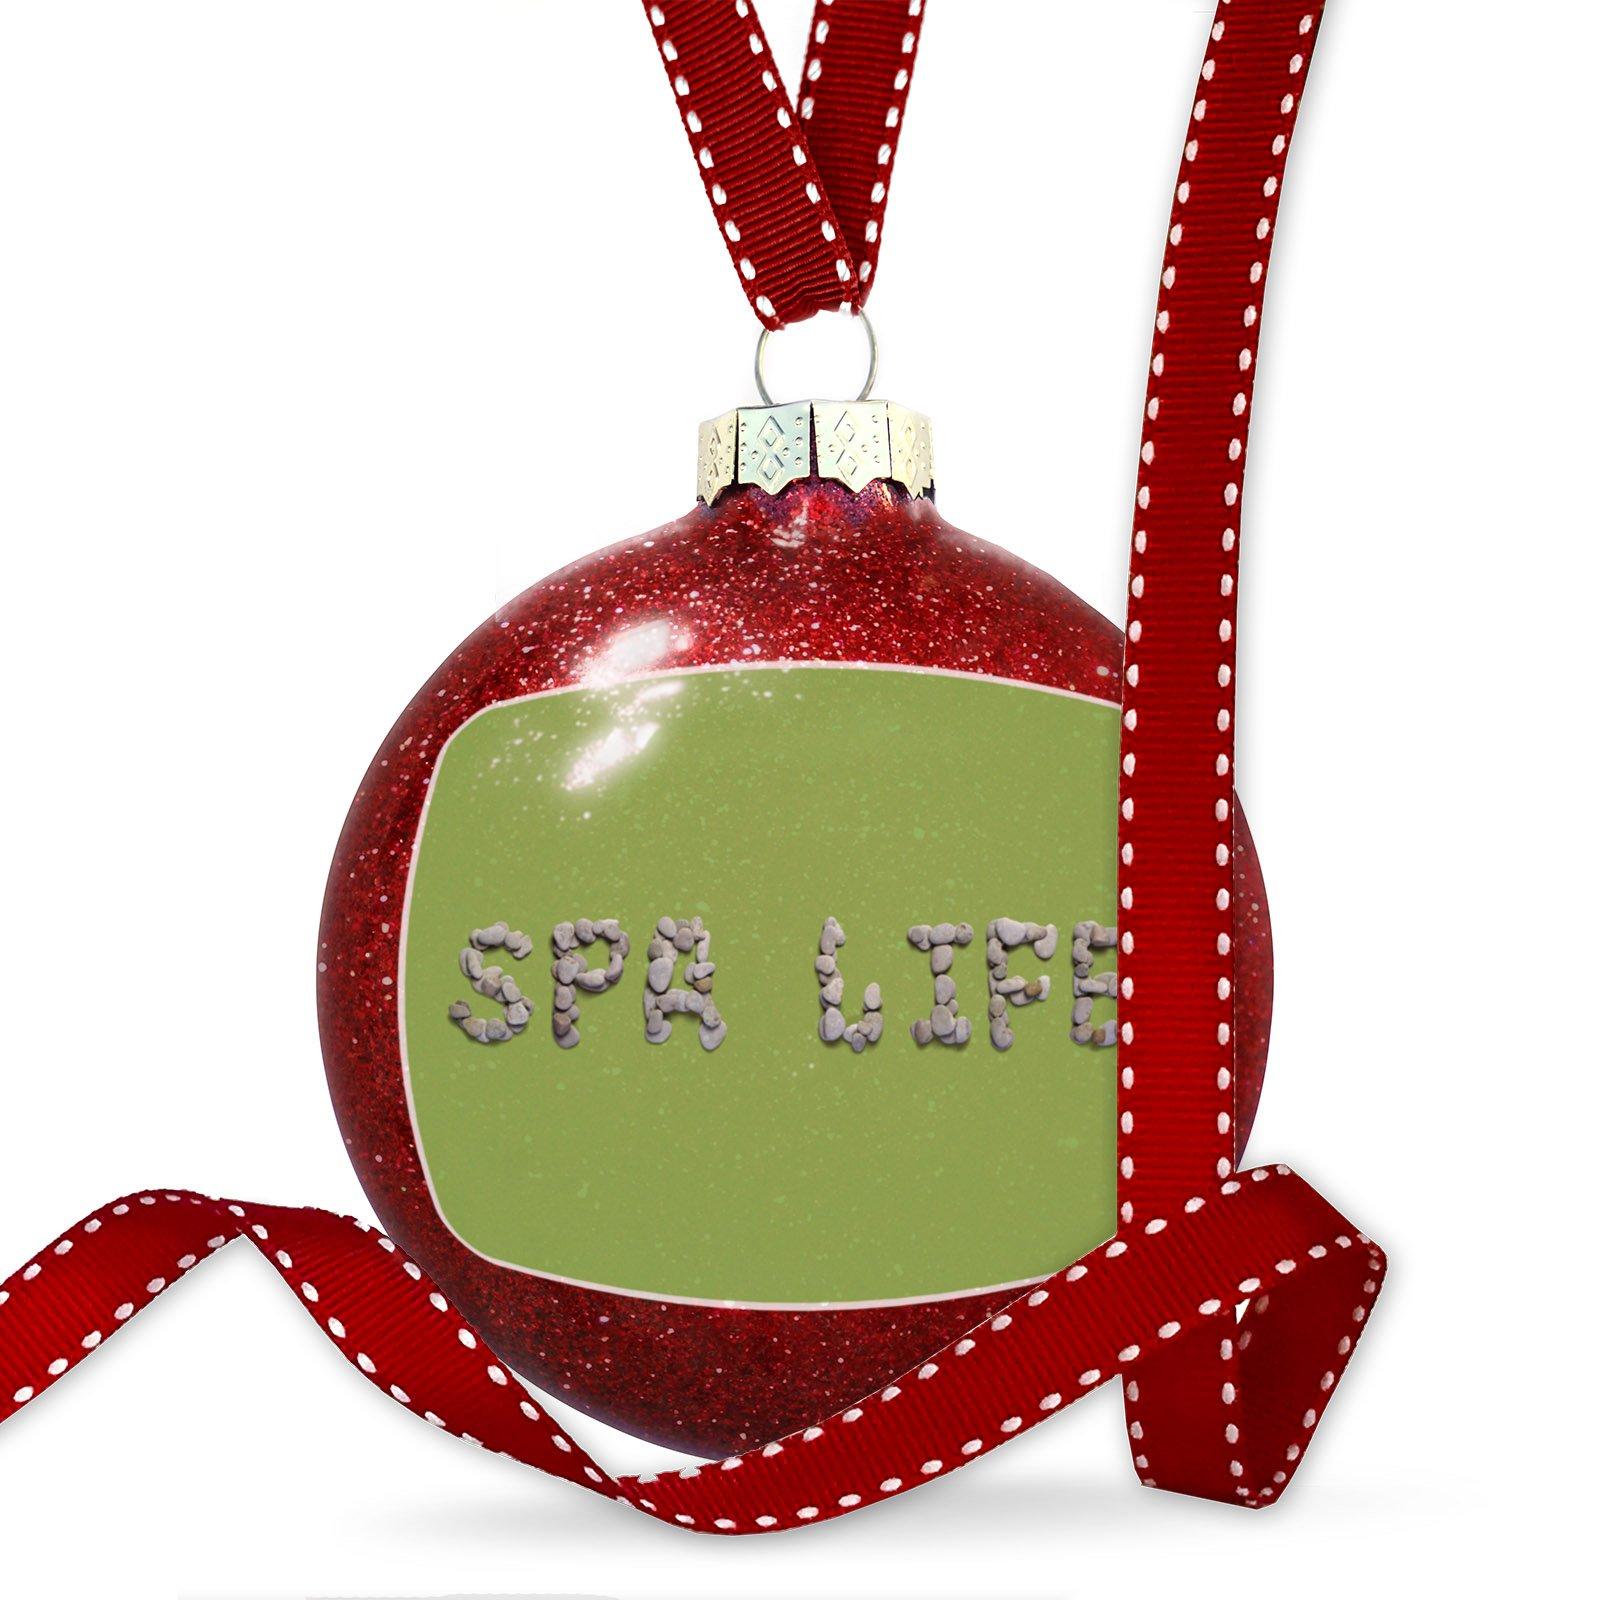 Christmas Decoration Spa Life Spa Stones Rocks Ornament